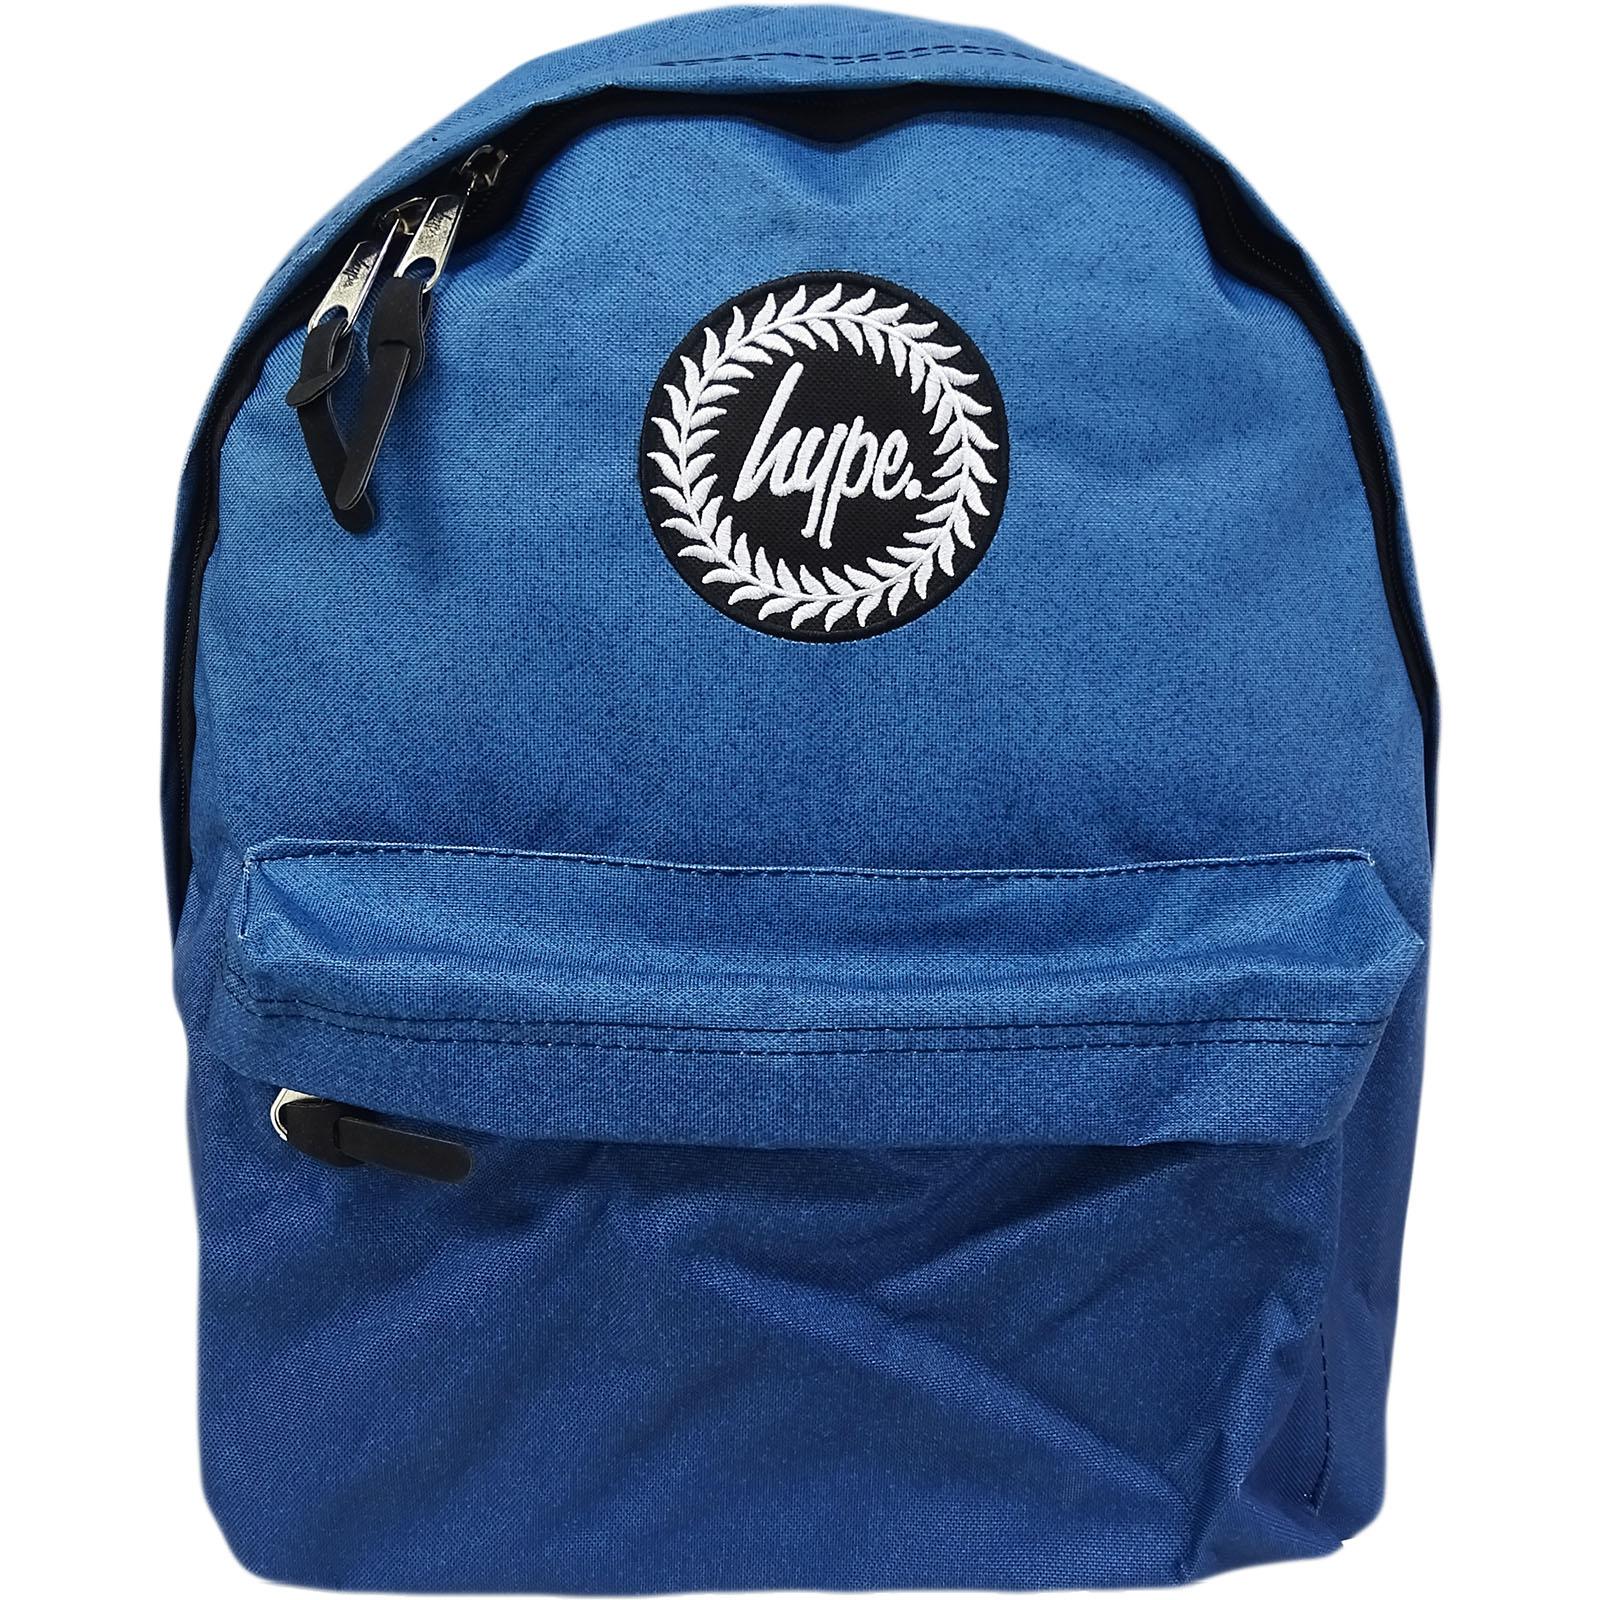 388bf6ec1e Sentinel Hype Speckle Fade Backpack   Rucksack Bag - Speckle Fade Blue    Navy